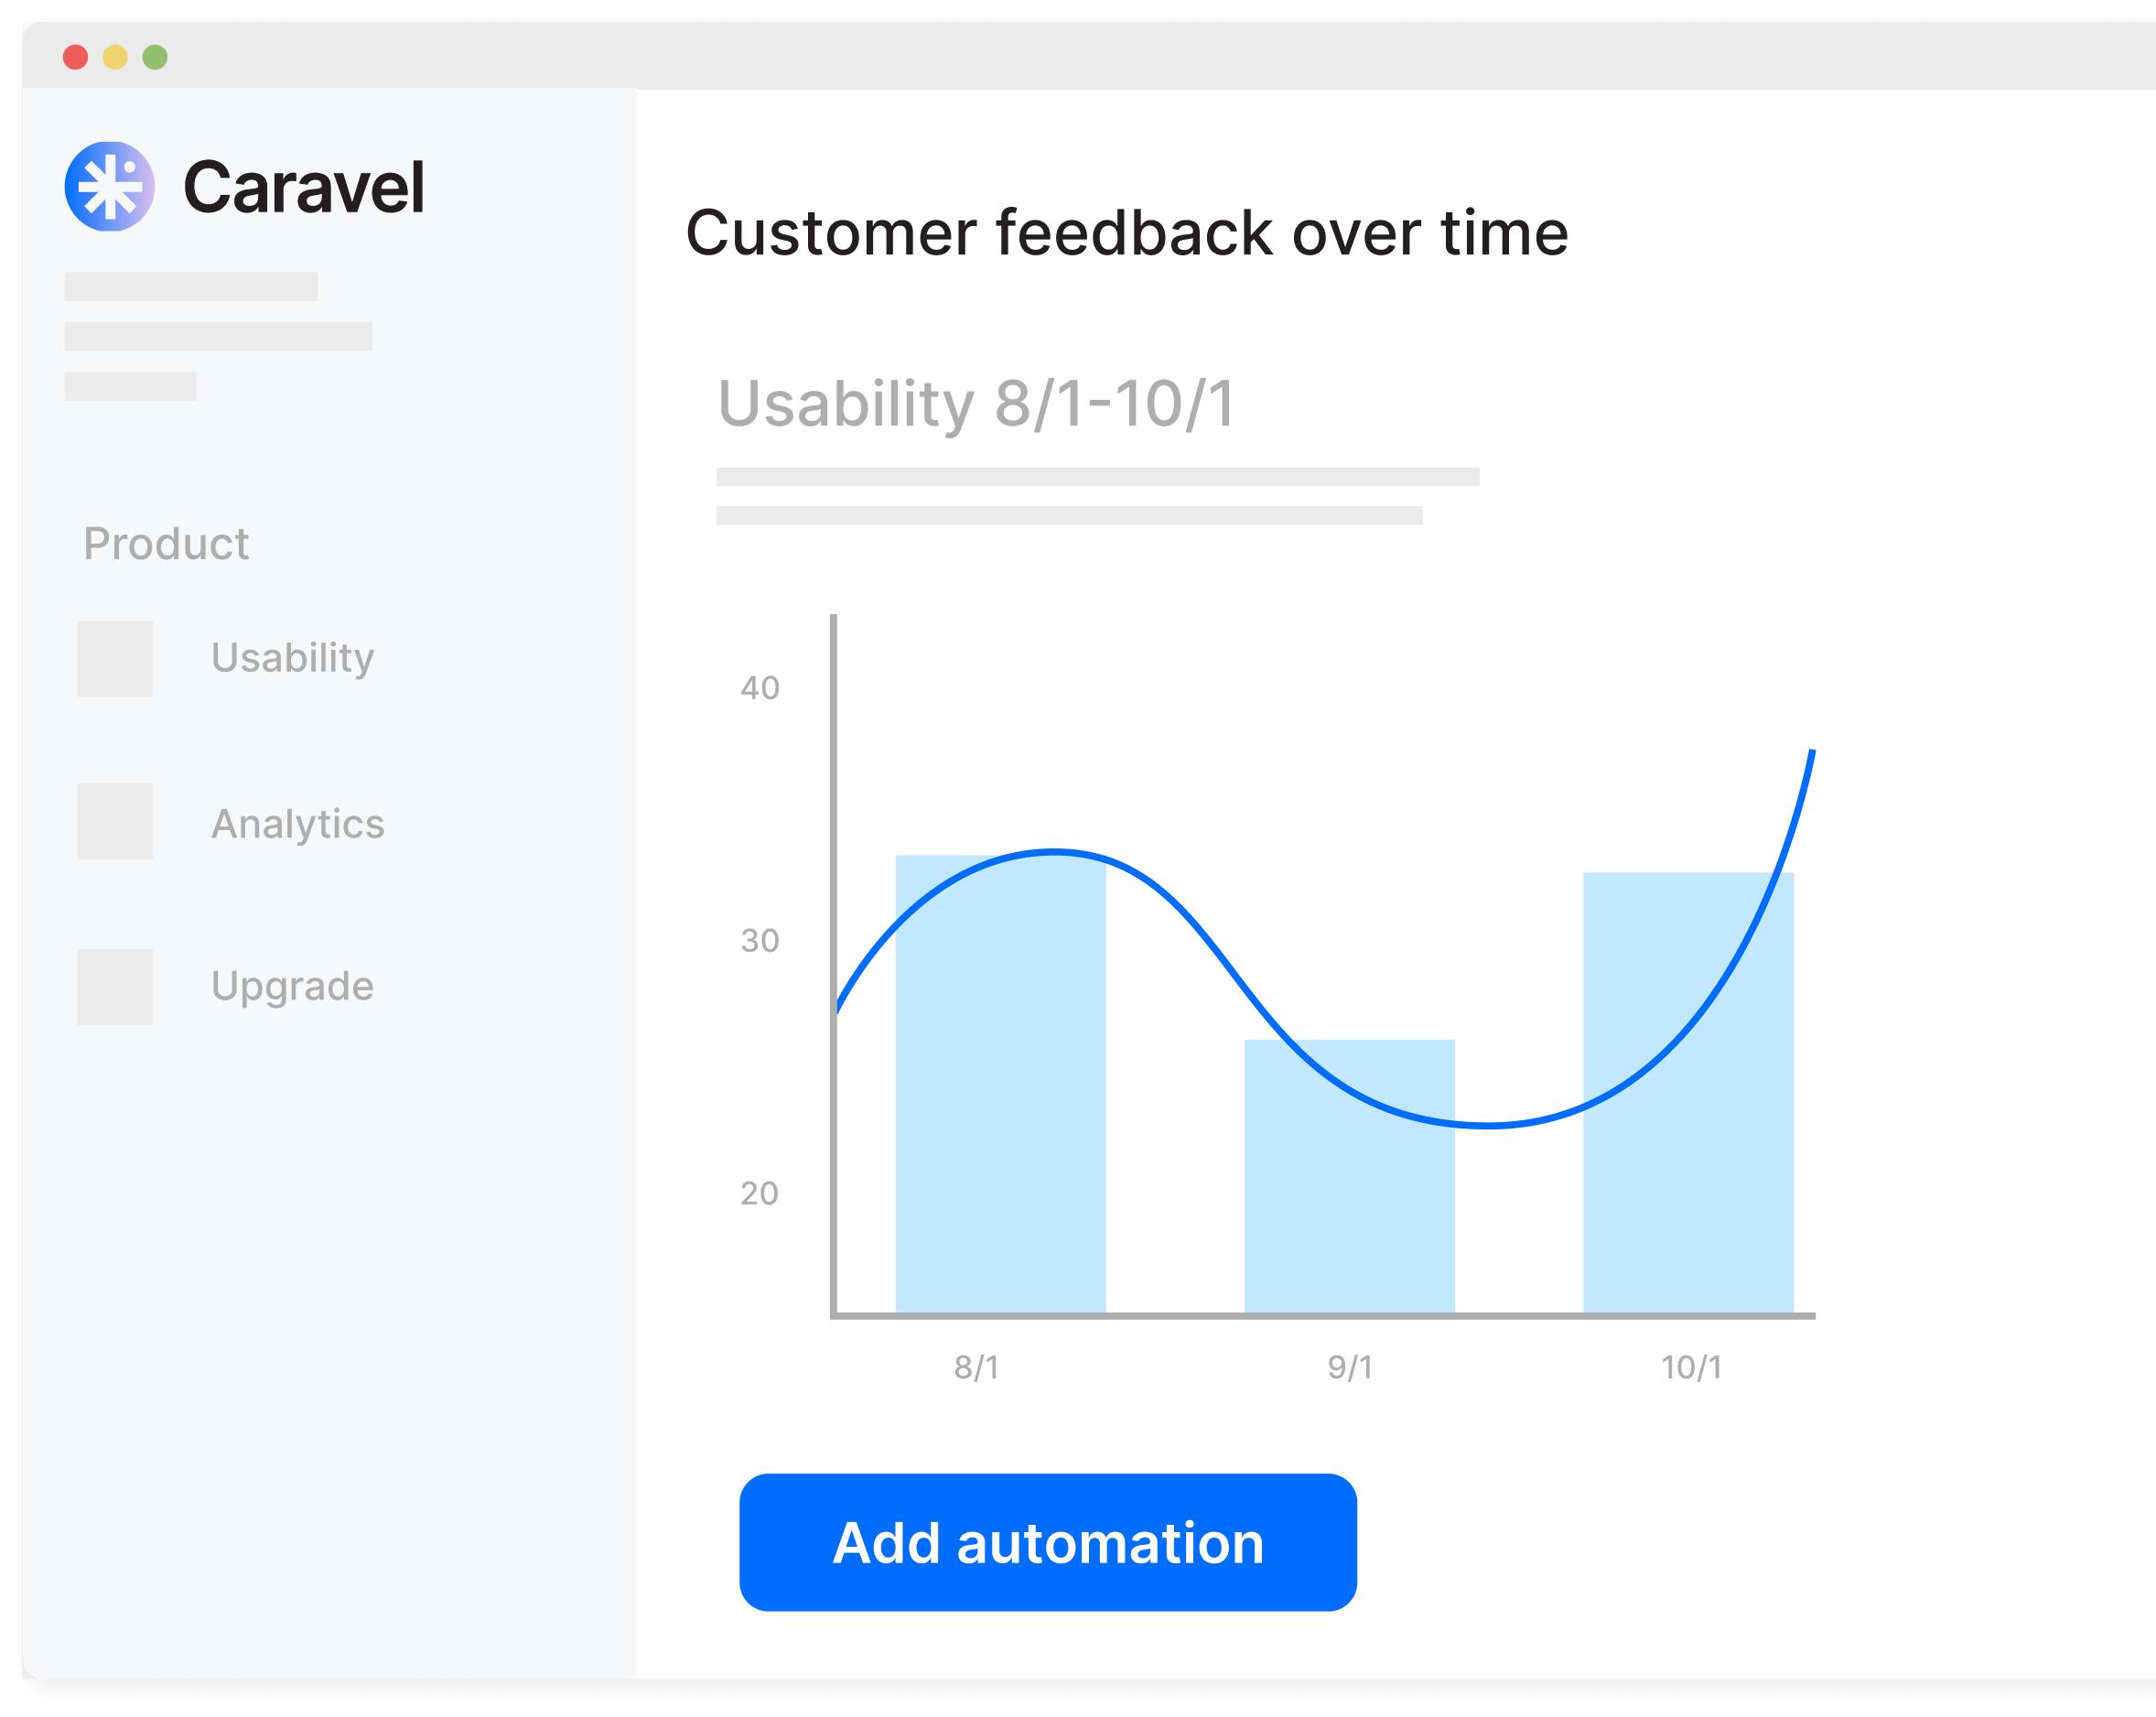 UI of customer feedback over time